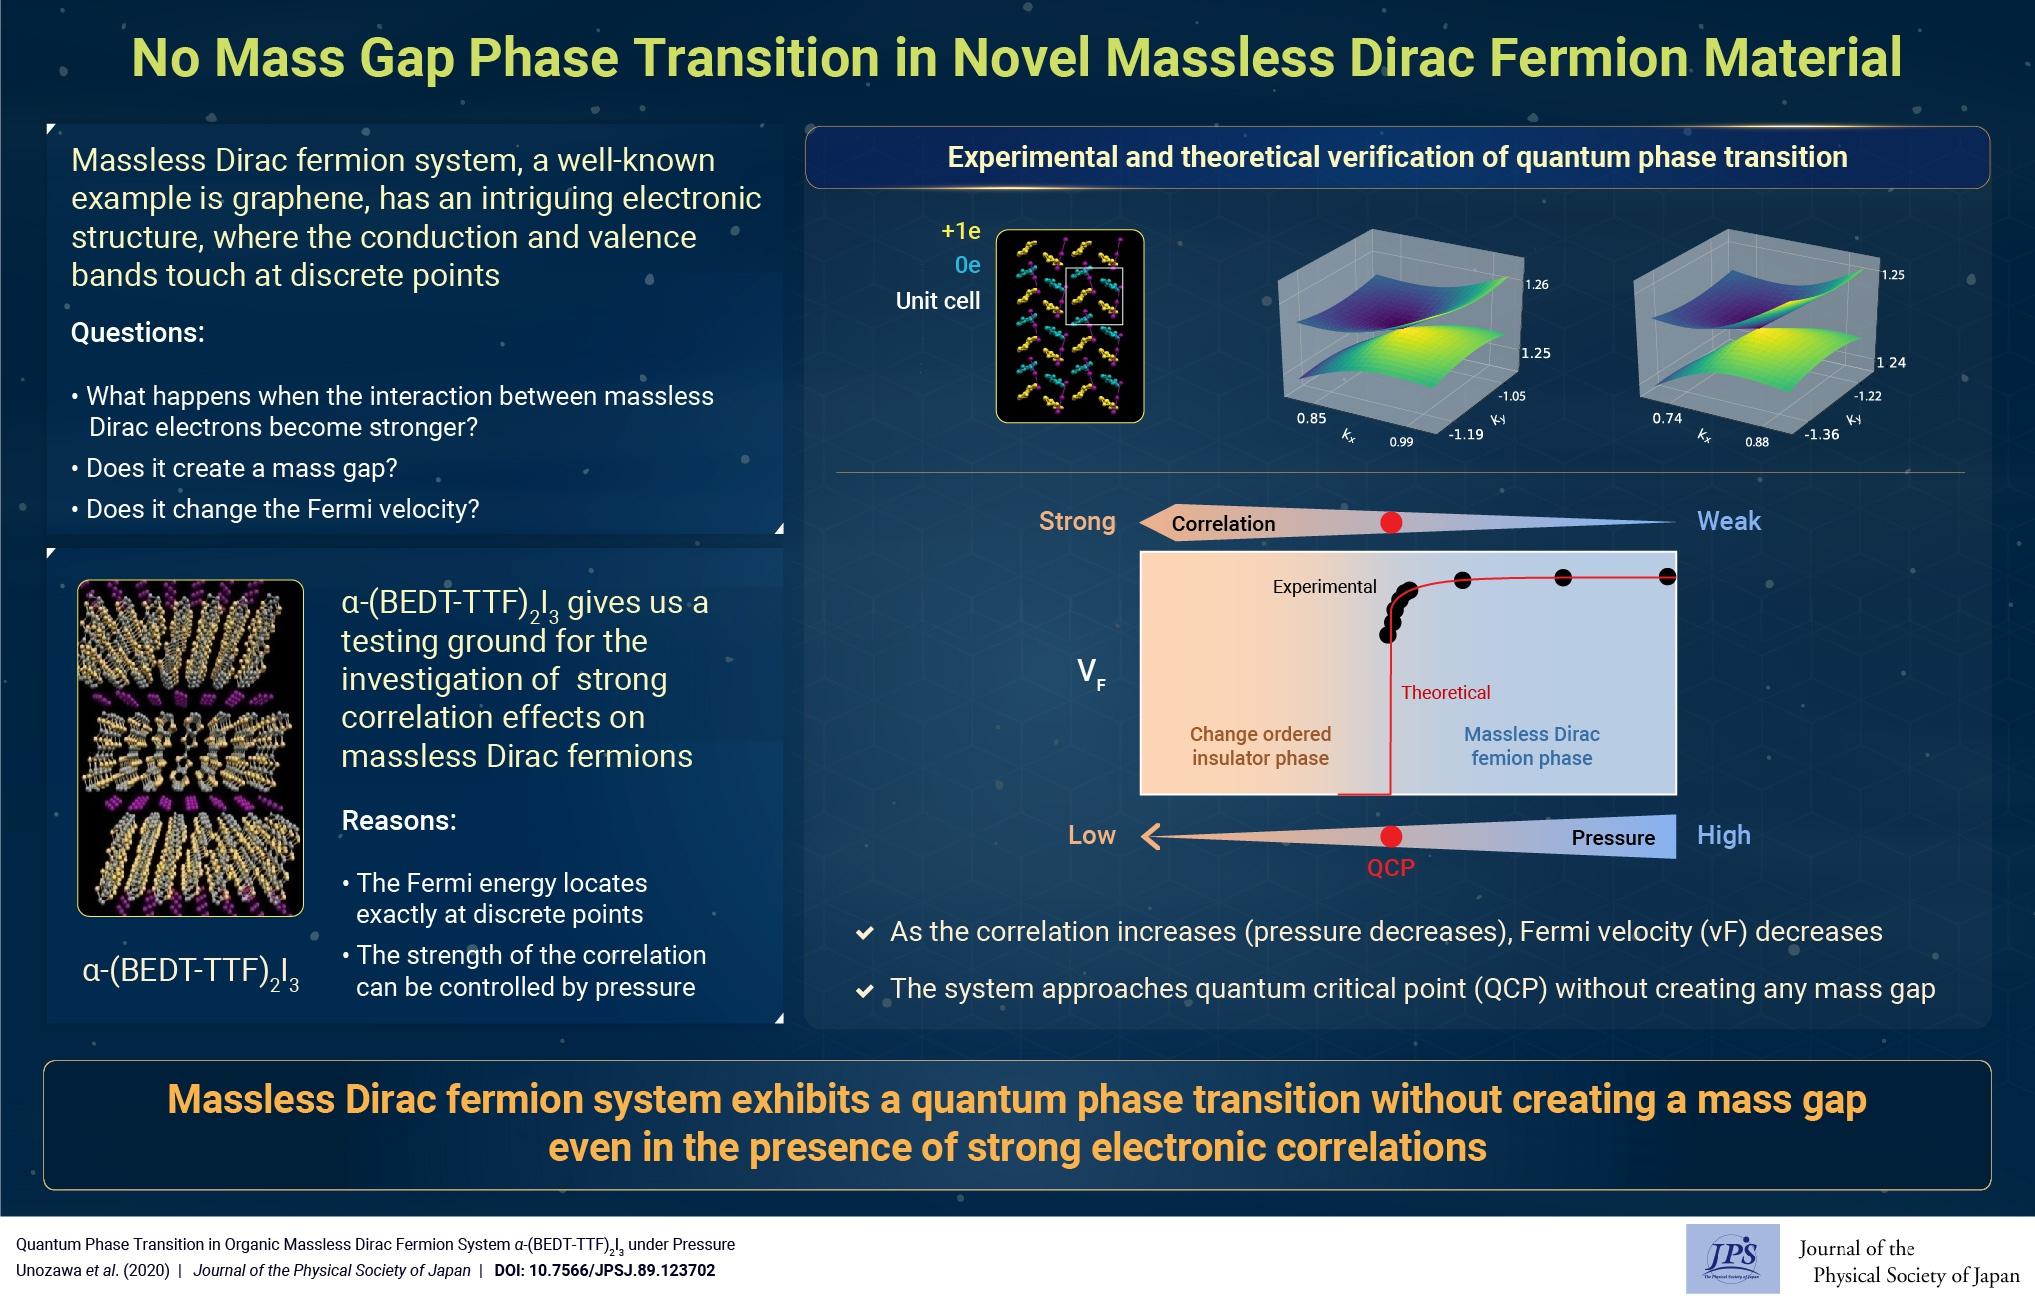 No Mass Gap Phase Transition in Novel Massless Dirac Fermion Material